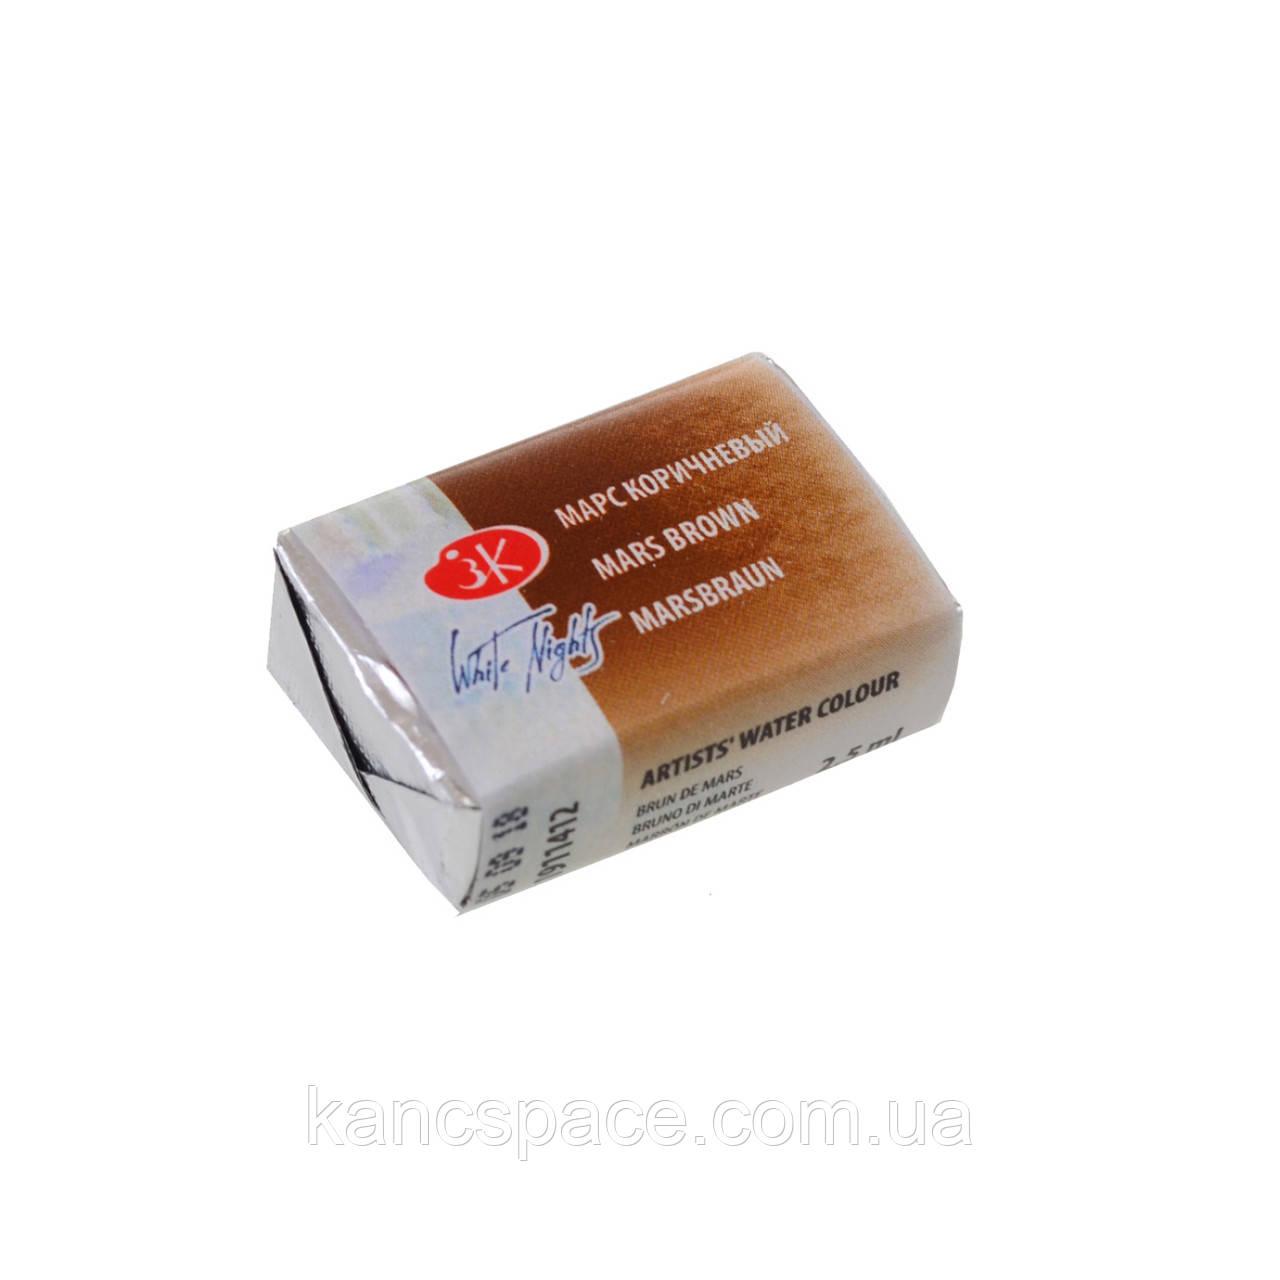 Фарба акварельна КЮВЕТА, марс коричневий, 2.5мл ЗХК